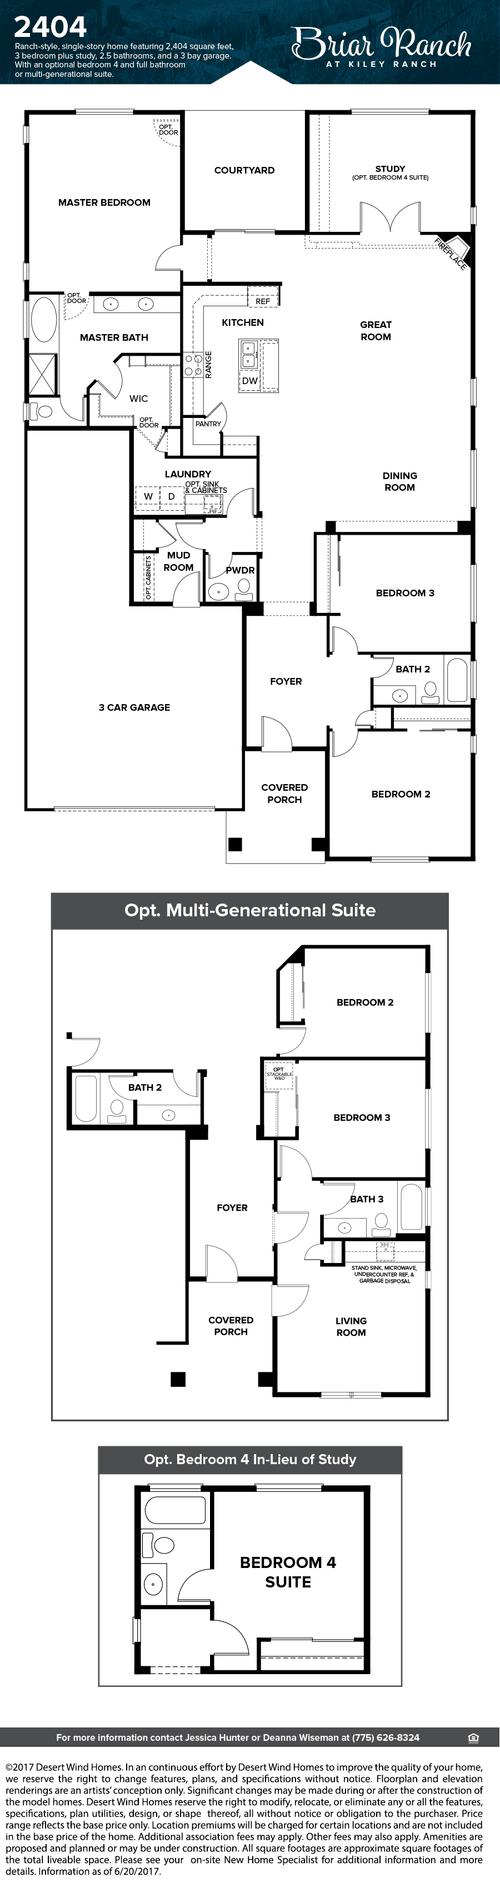 2404 - Floorplan